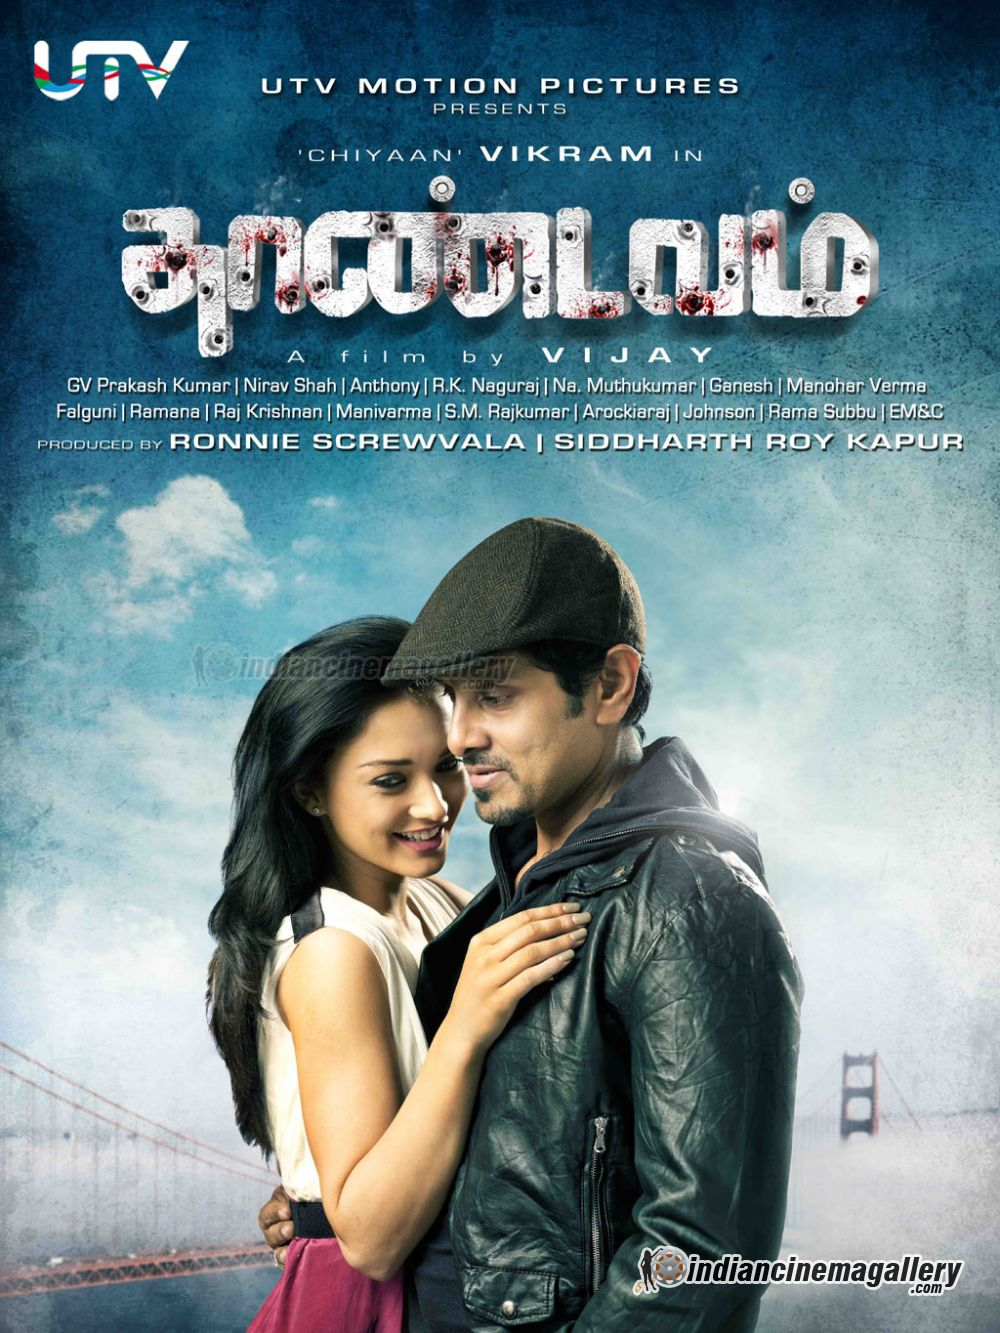 Vallavanukku pullum aayudham tamil movie mp3 songs | cine collectn's.